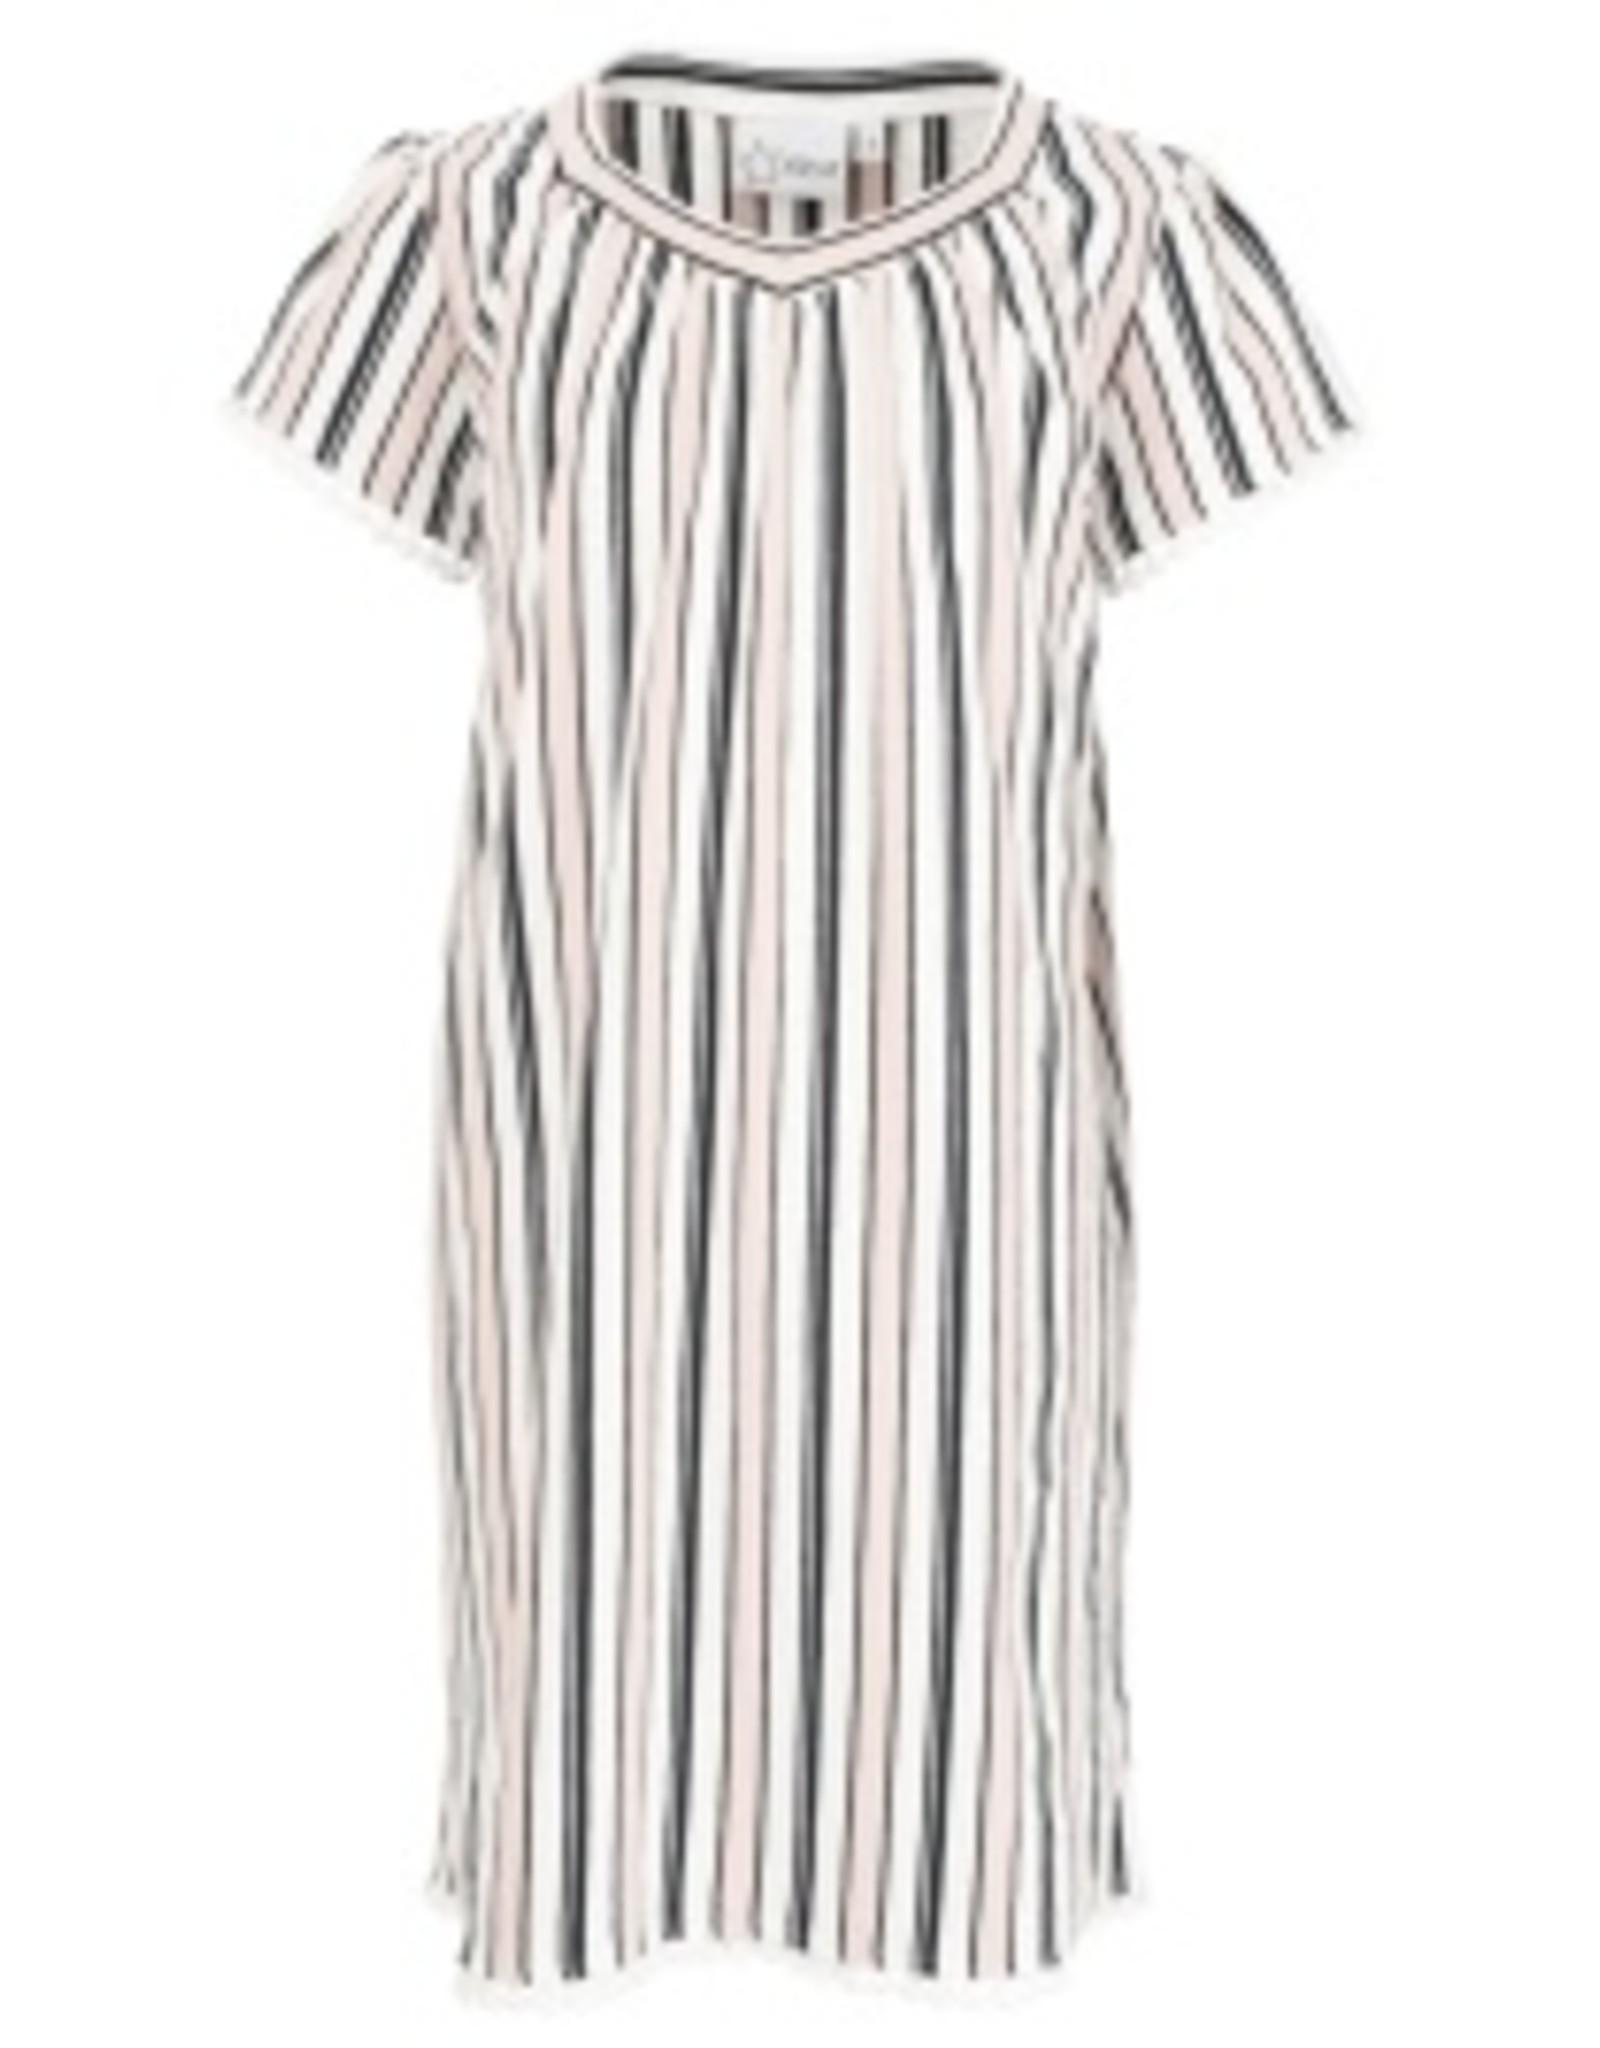 Starfreak Starfreak Short Dress Jersey Co/El Multi-Colour